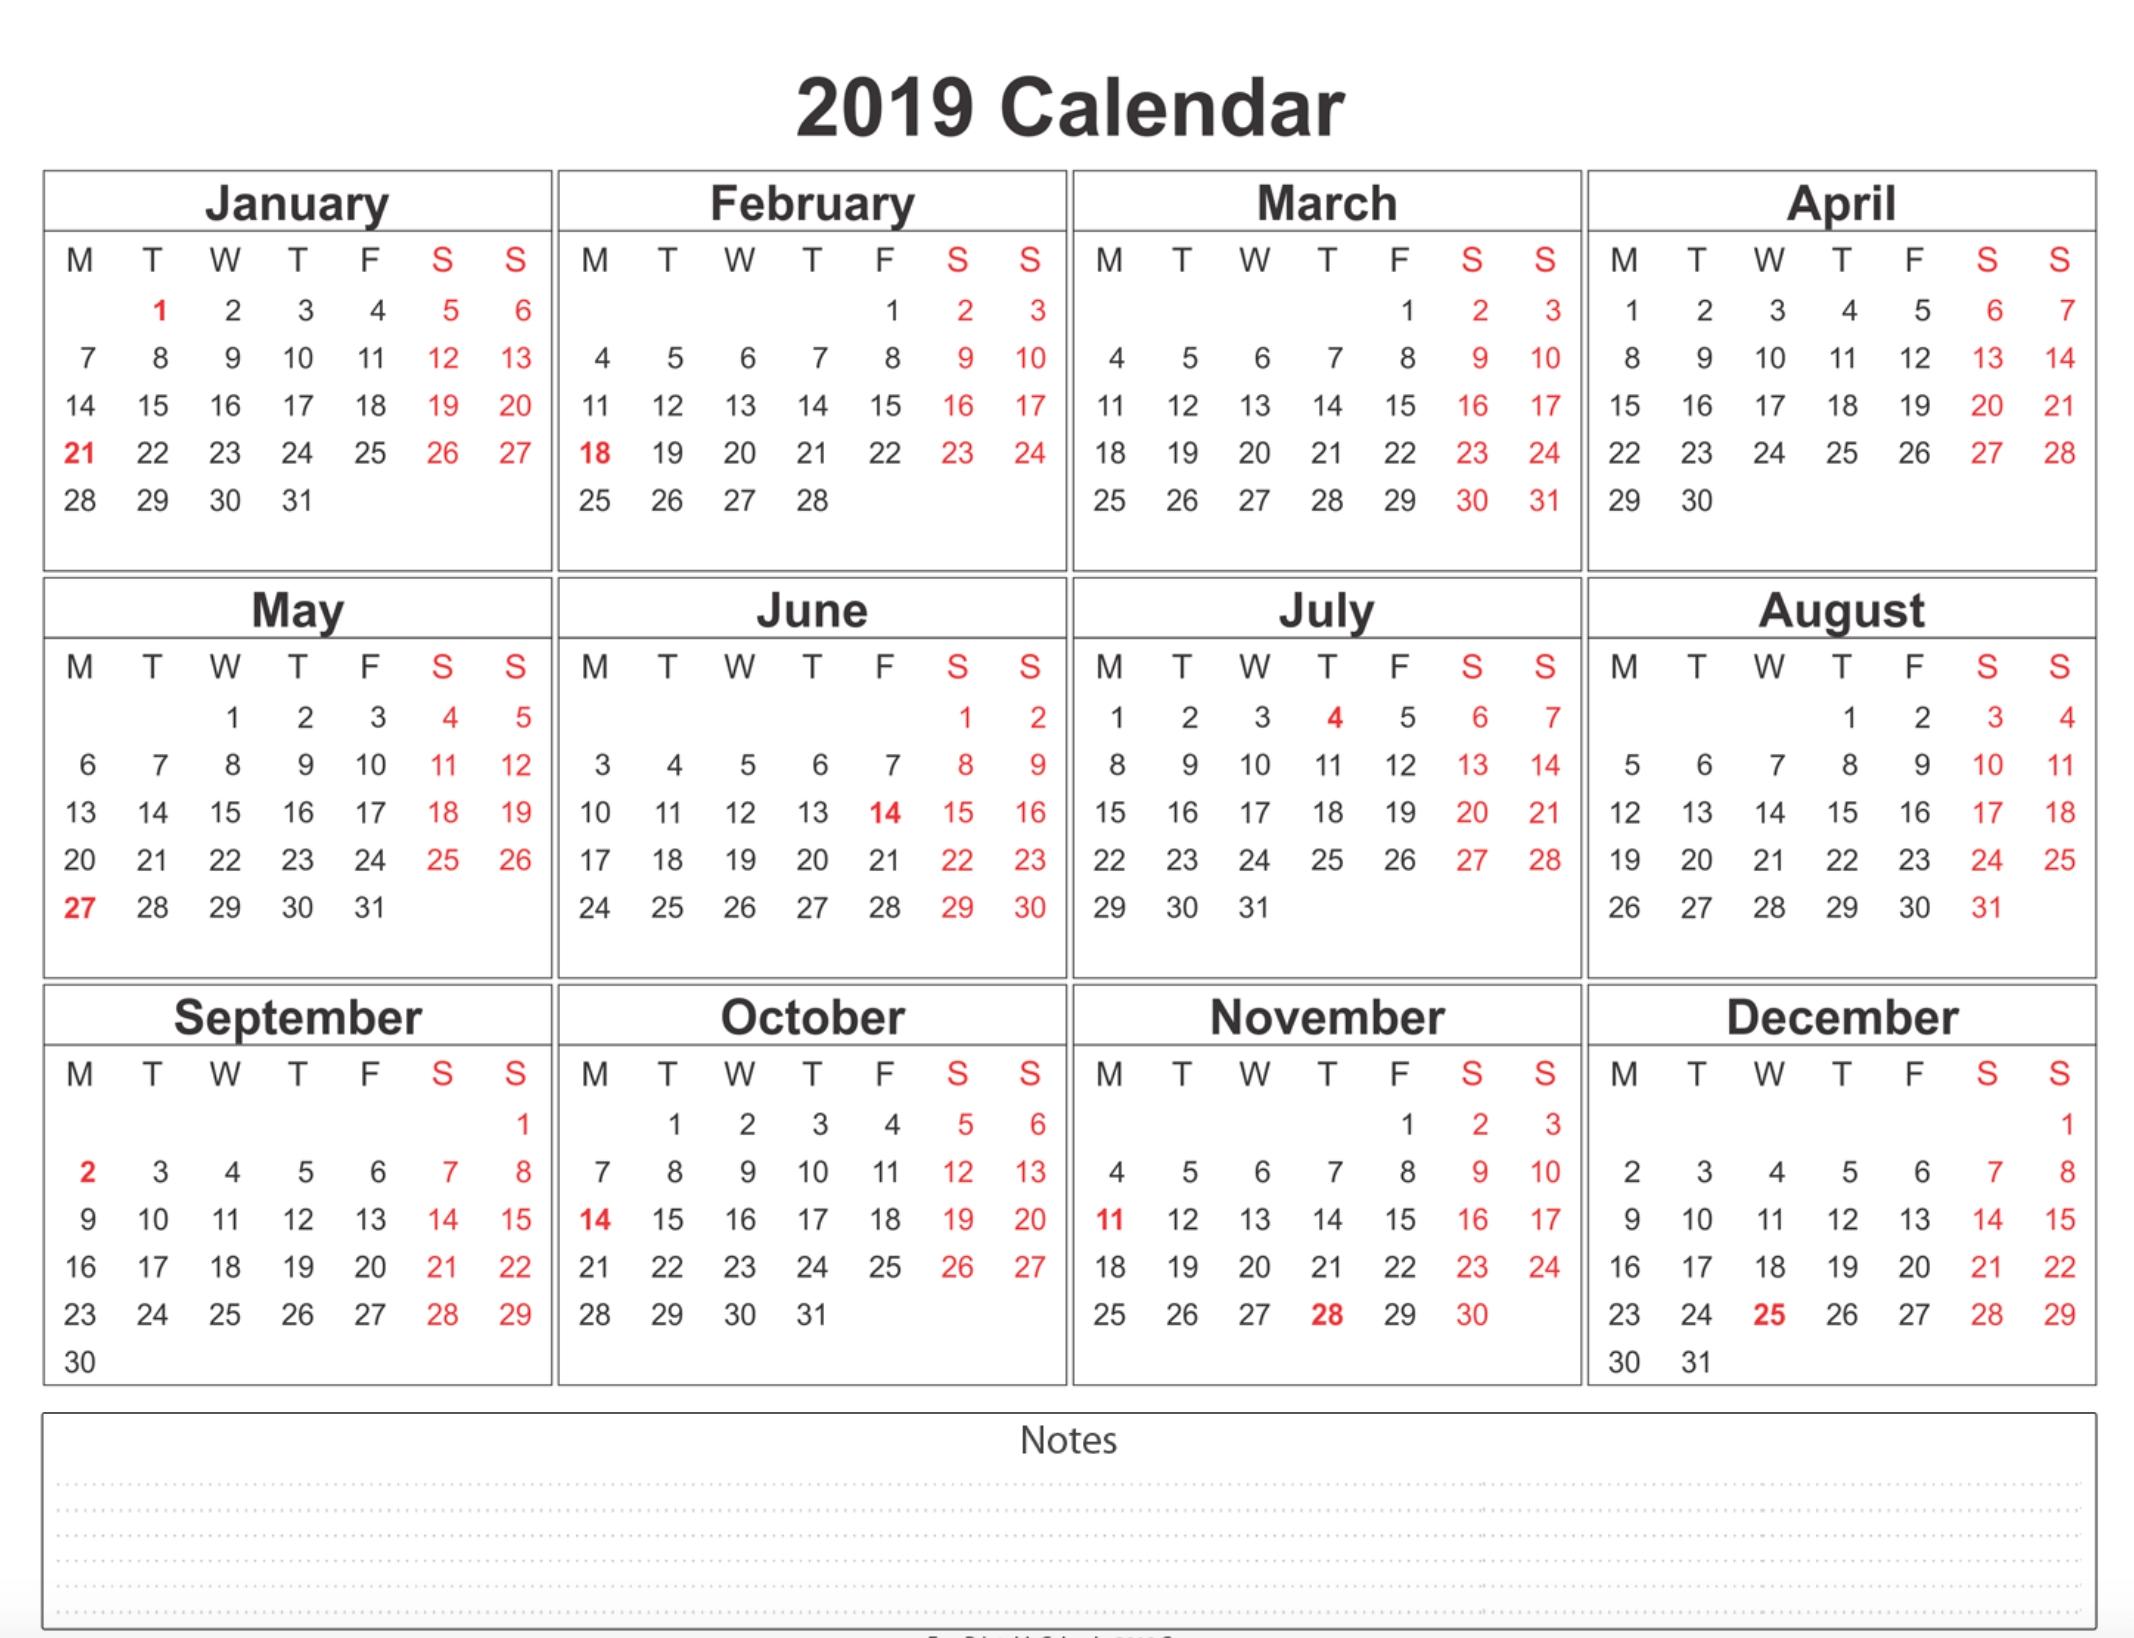 Free Printable Calendar 2019 With Holidays | Blank 12 Month Calendar Print A Calendar 2019 Free